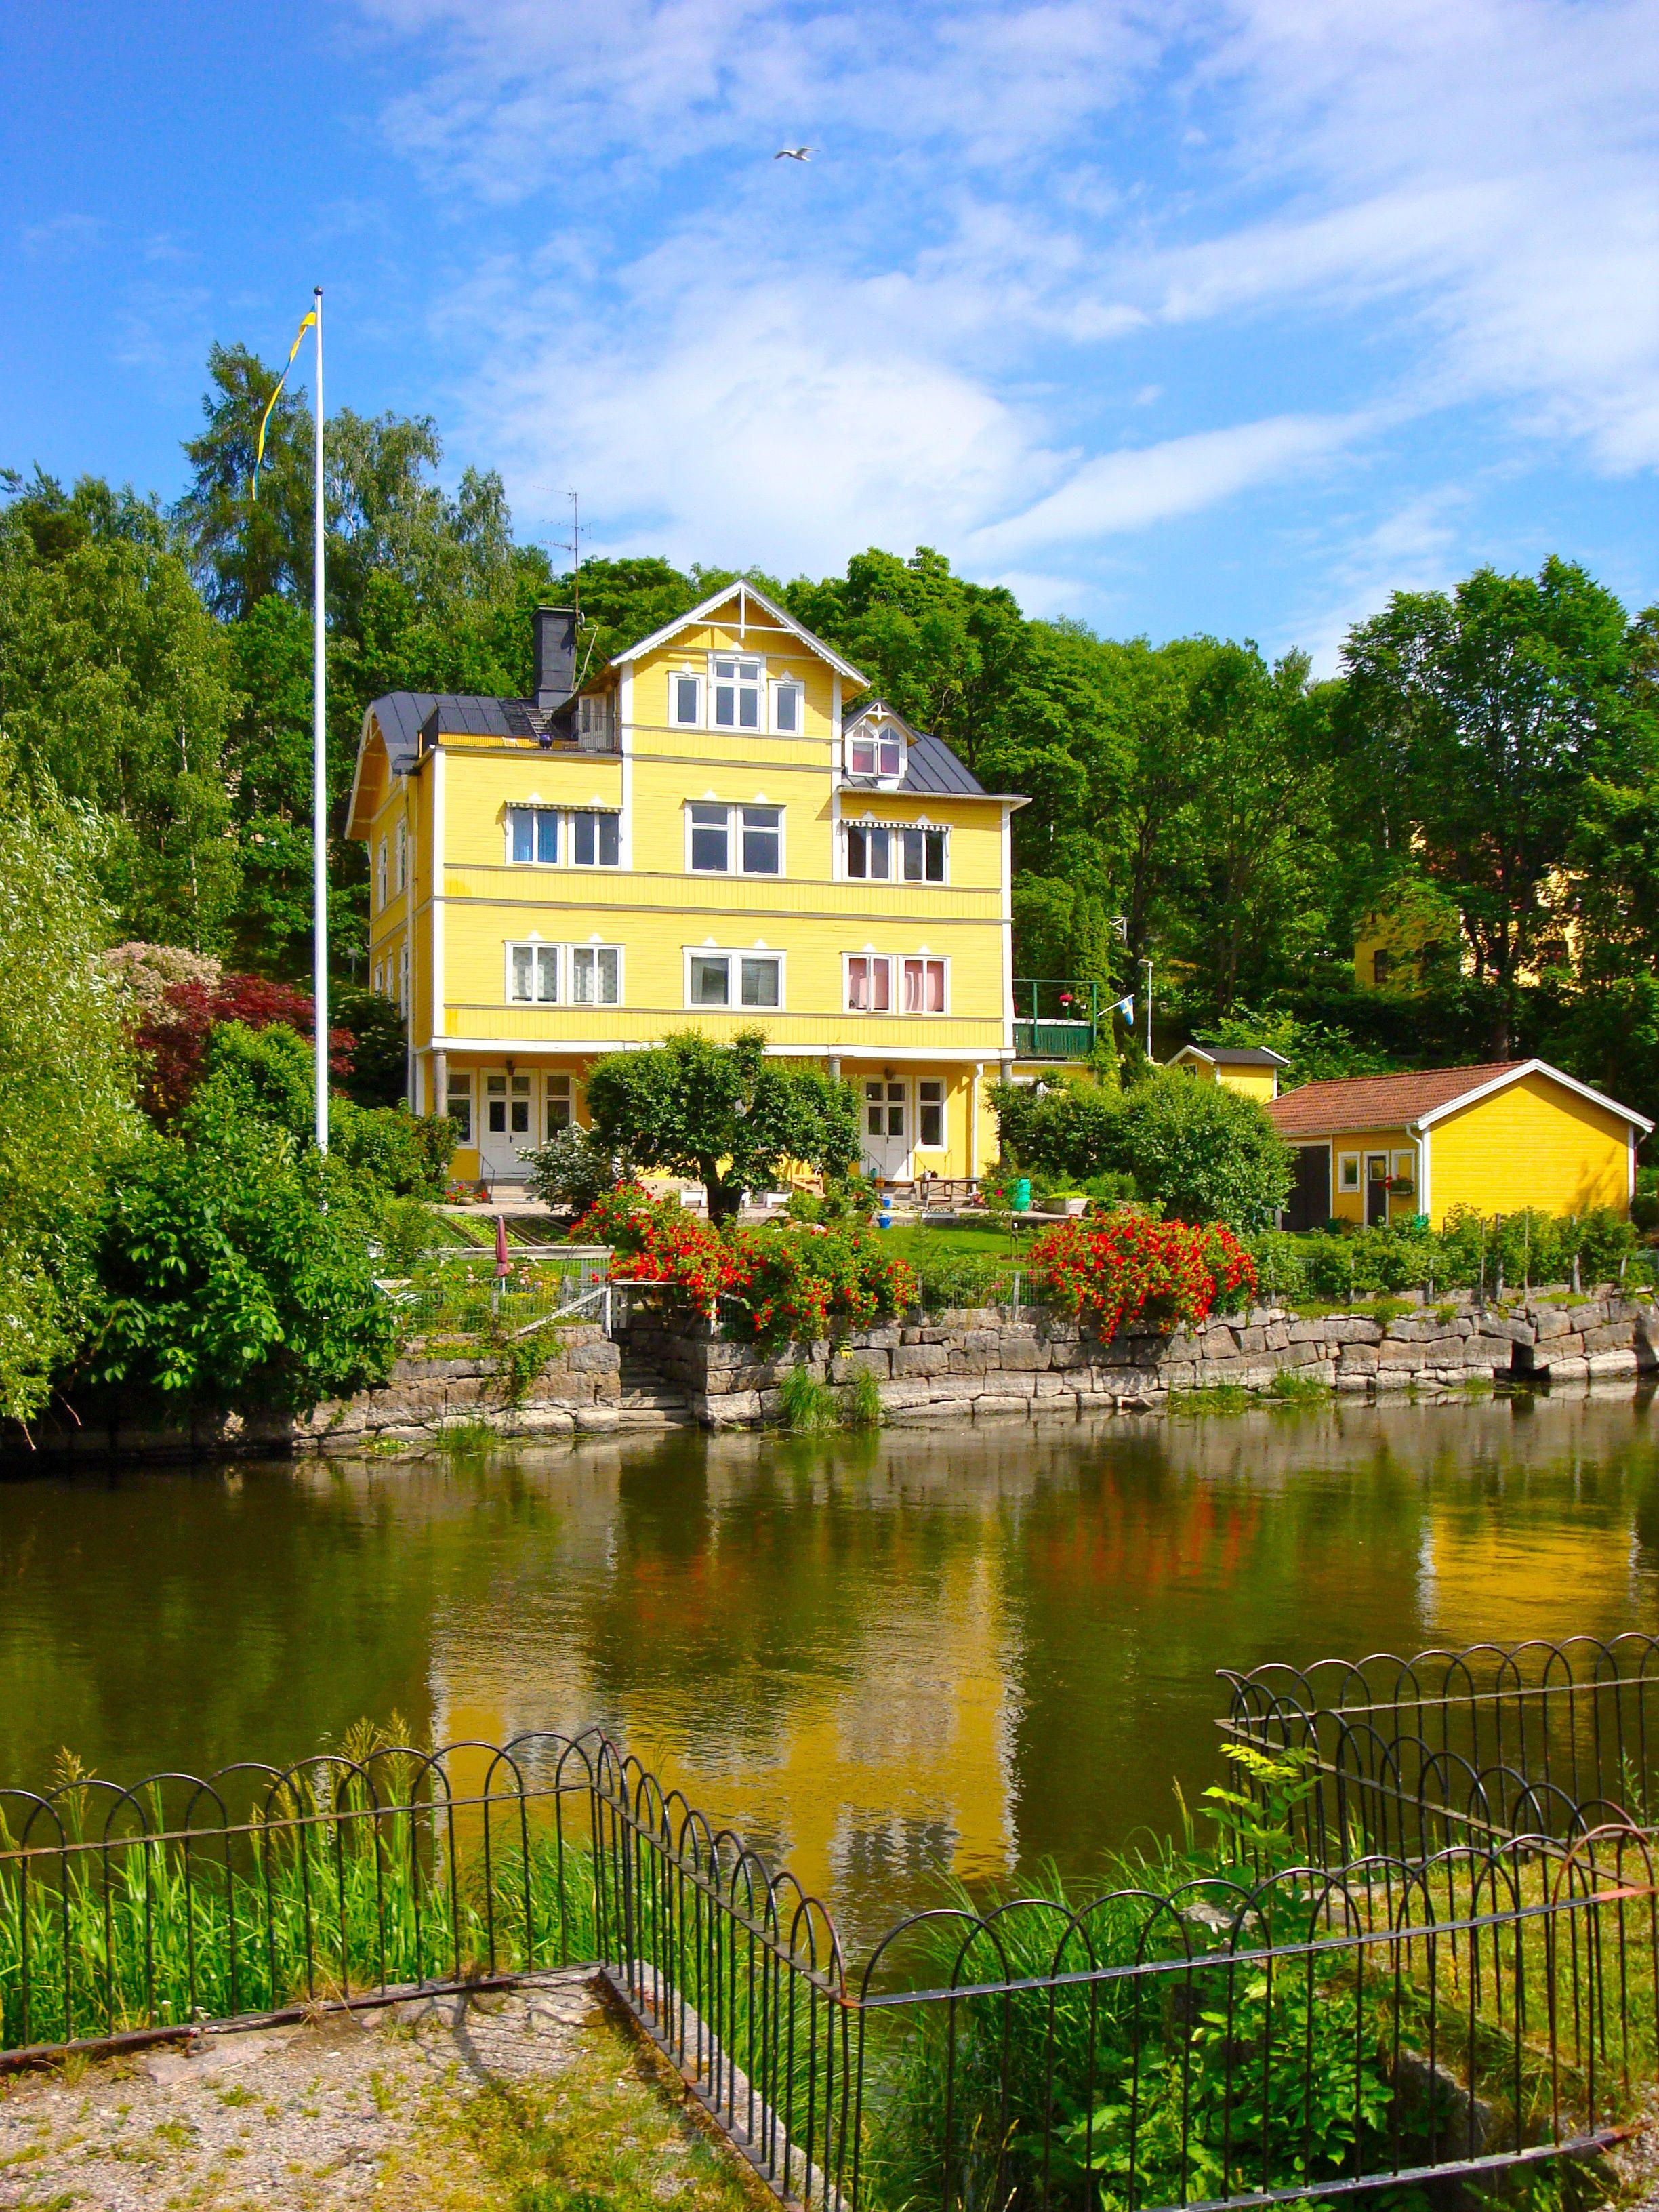 Torshalla, Sweden.